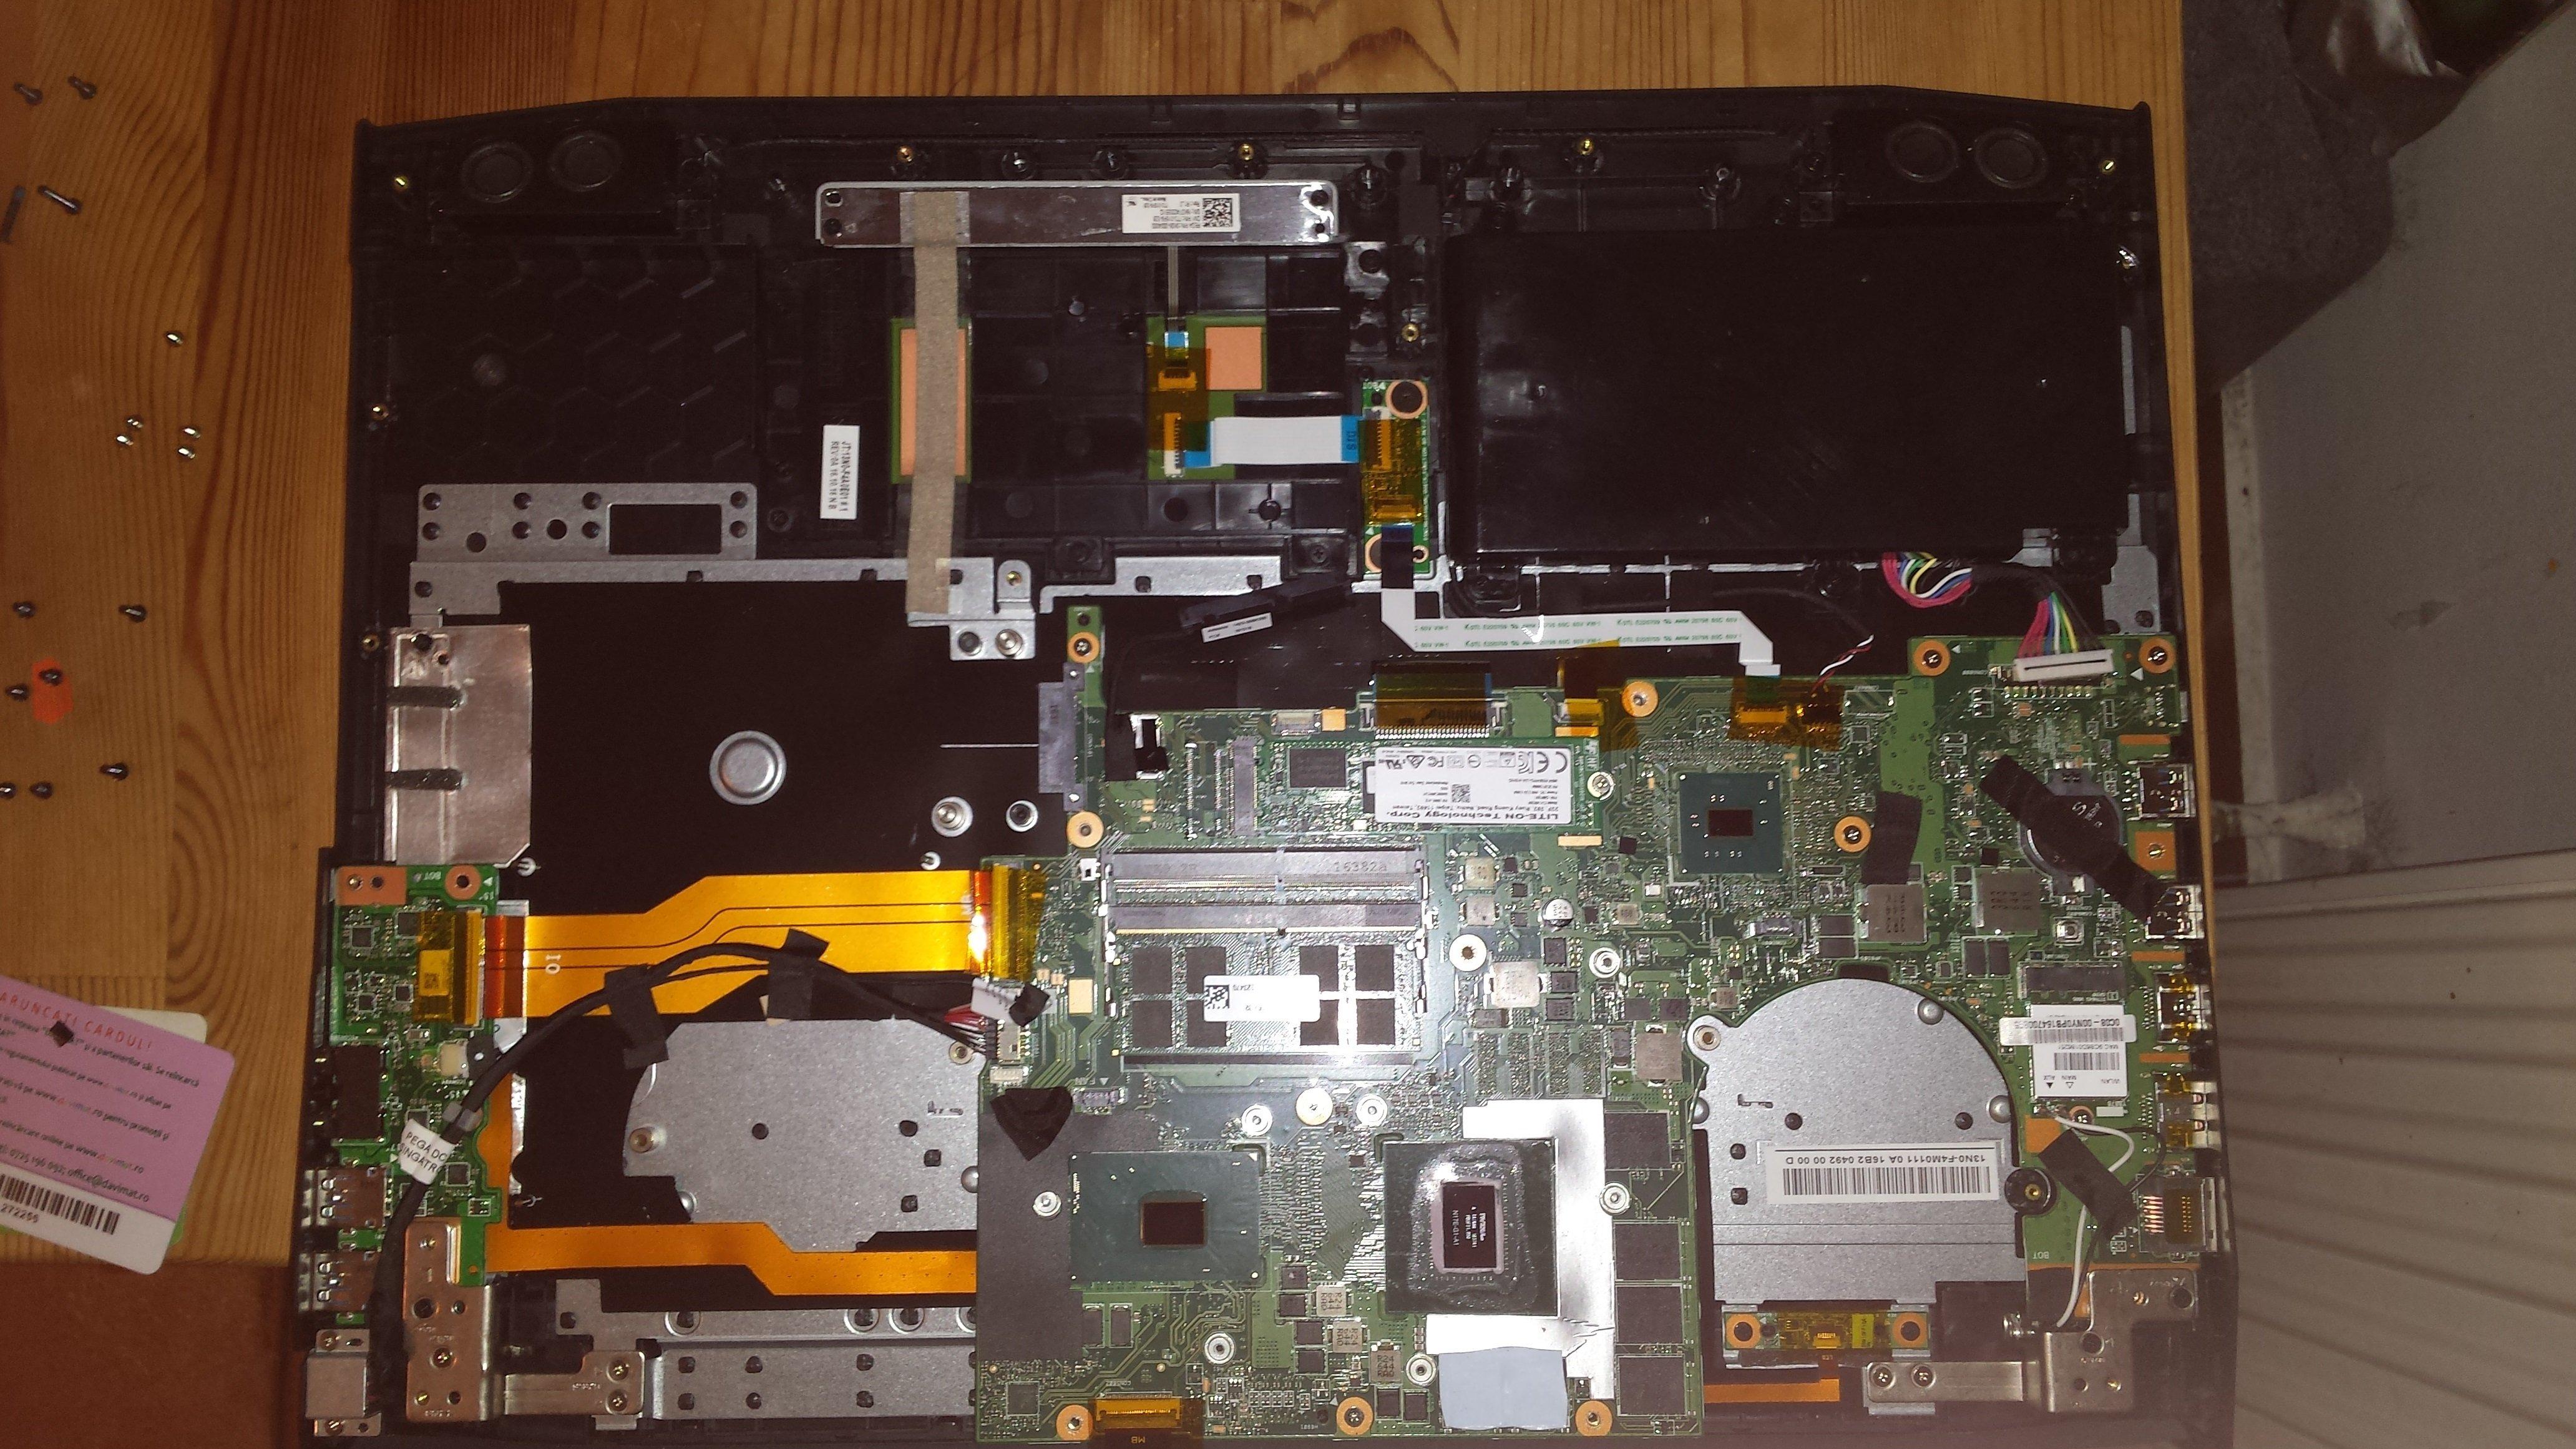 Acer Predator 17 G5 793 M2 Ssd Upgrade Community G9 0b